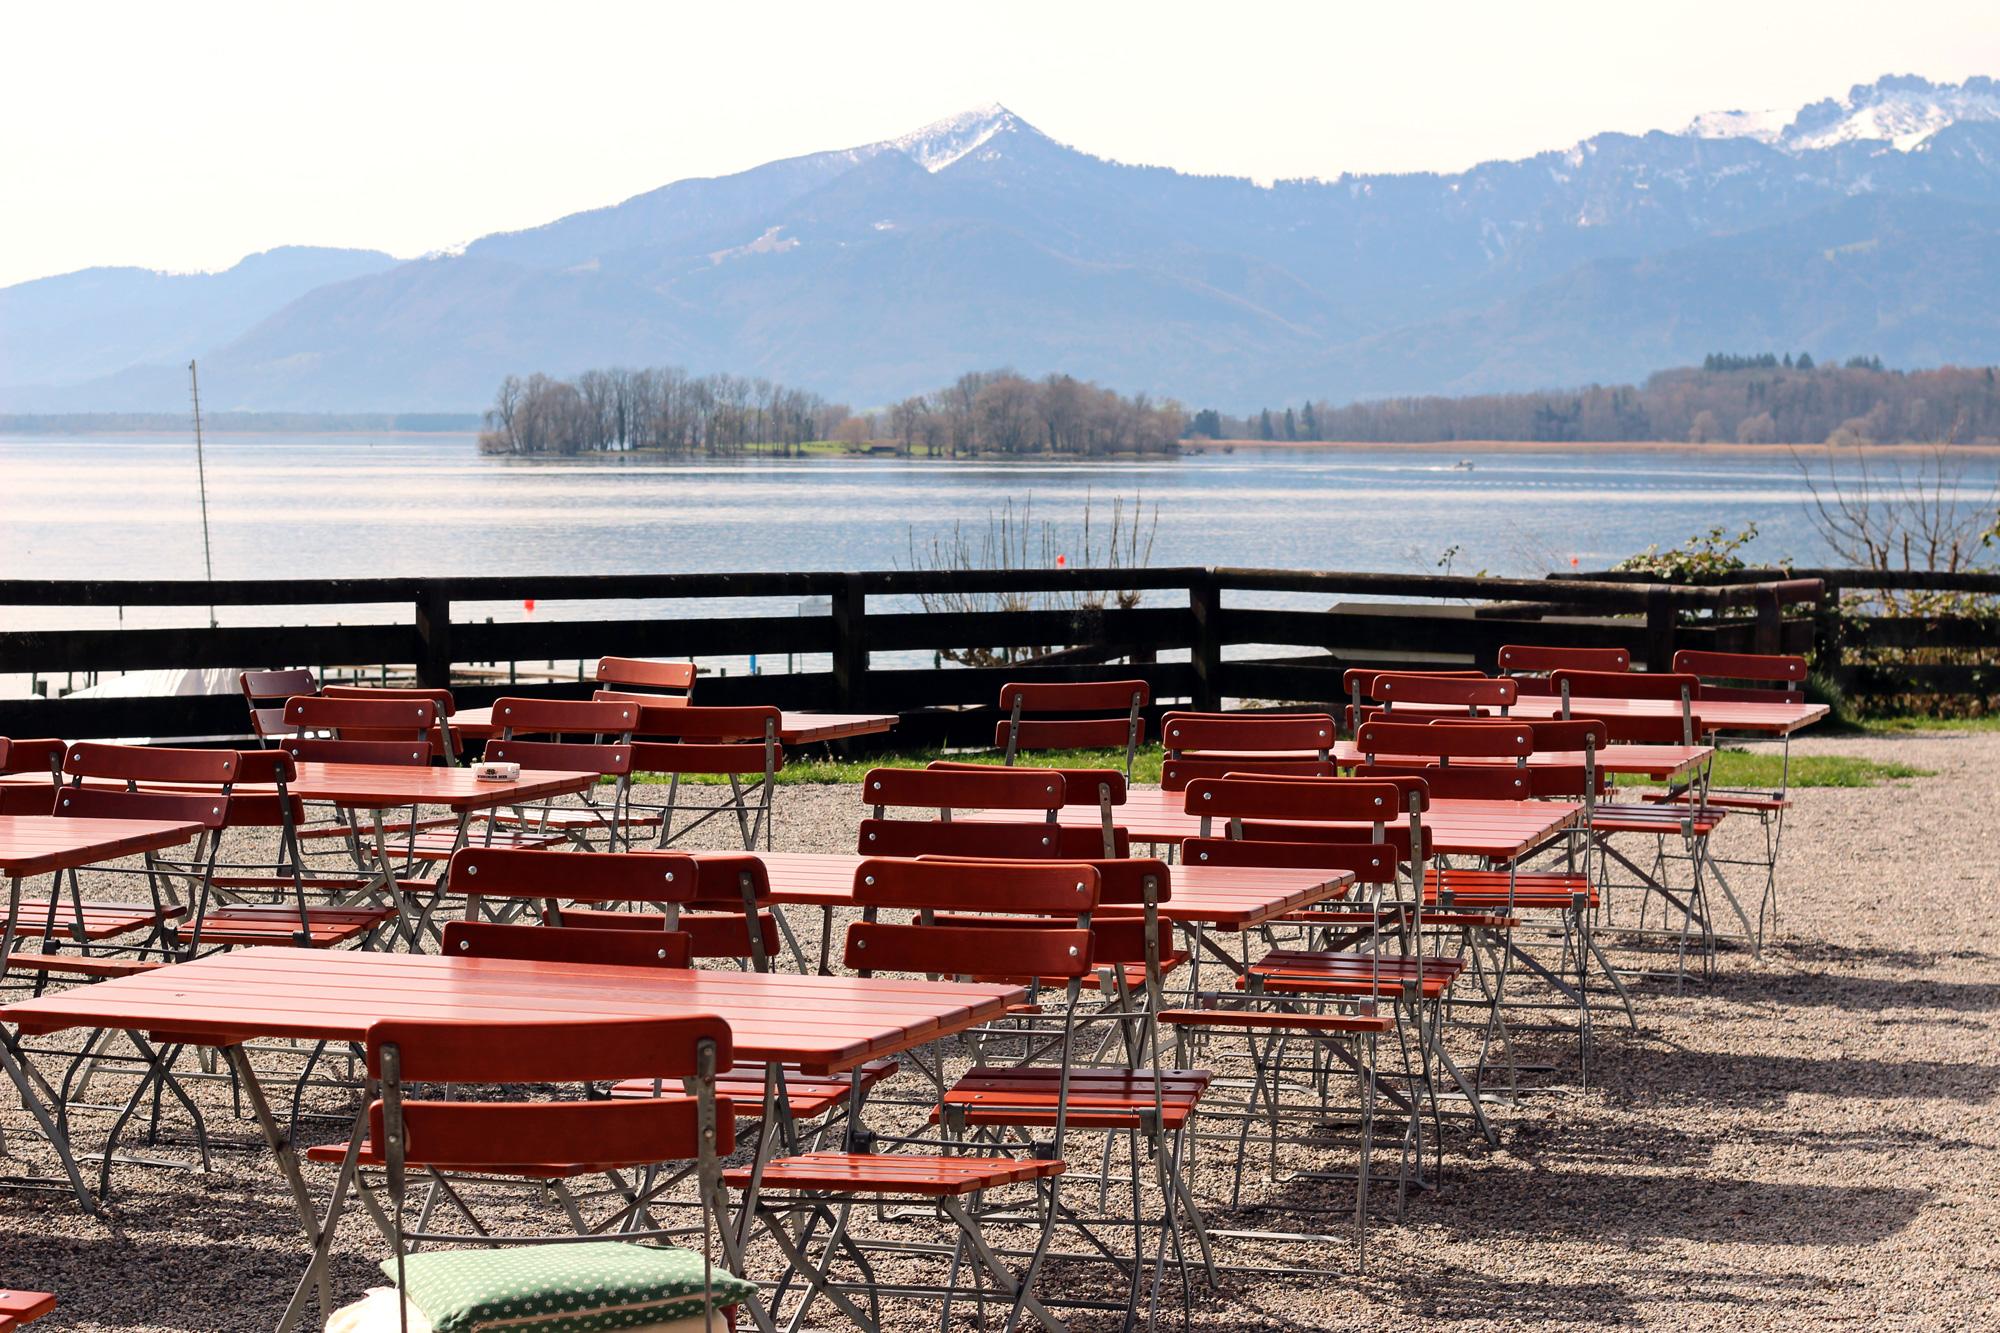 Cheimsee-lake-Bayern-weekend-escape-10